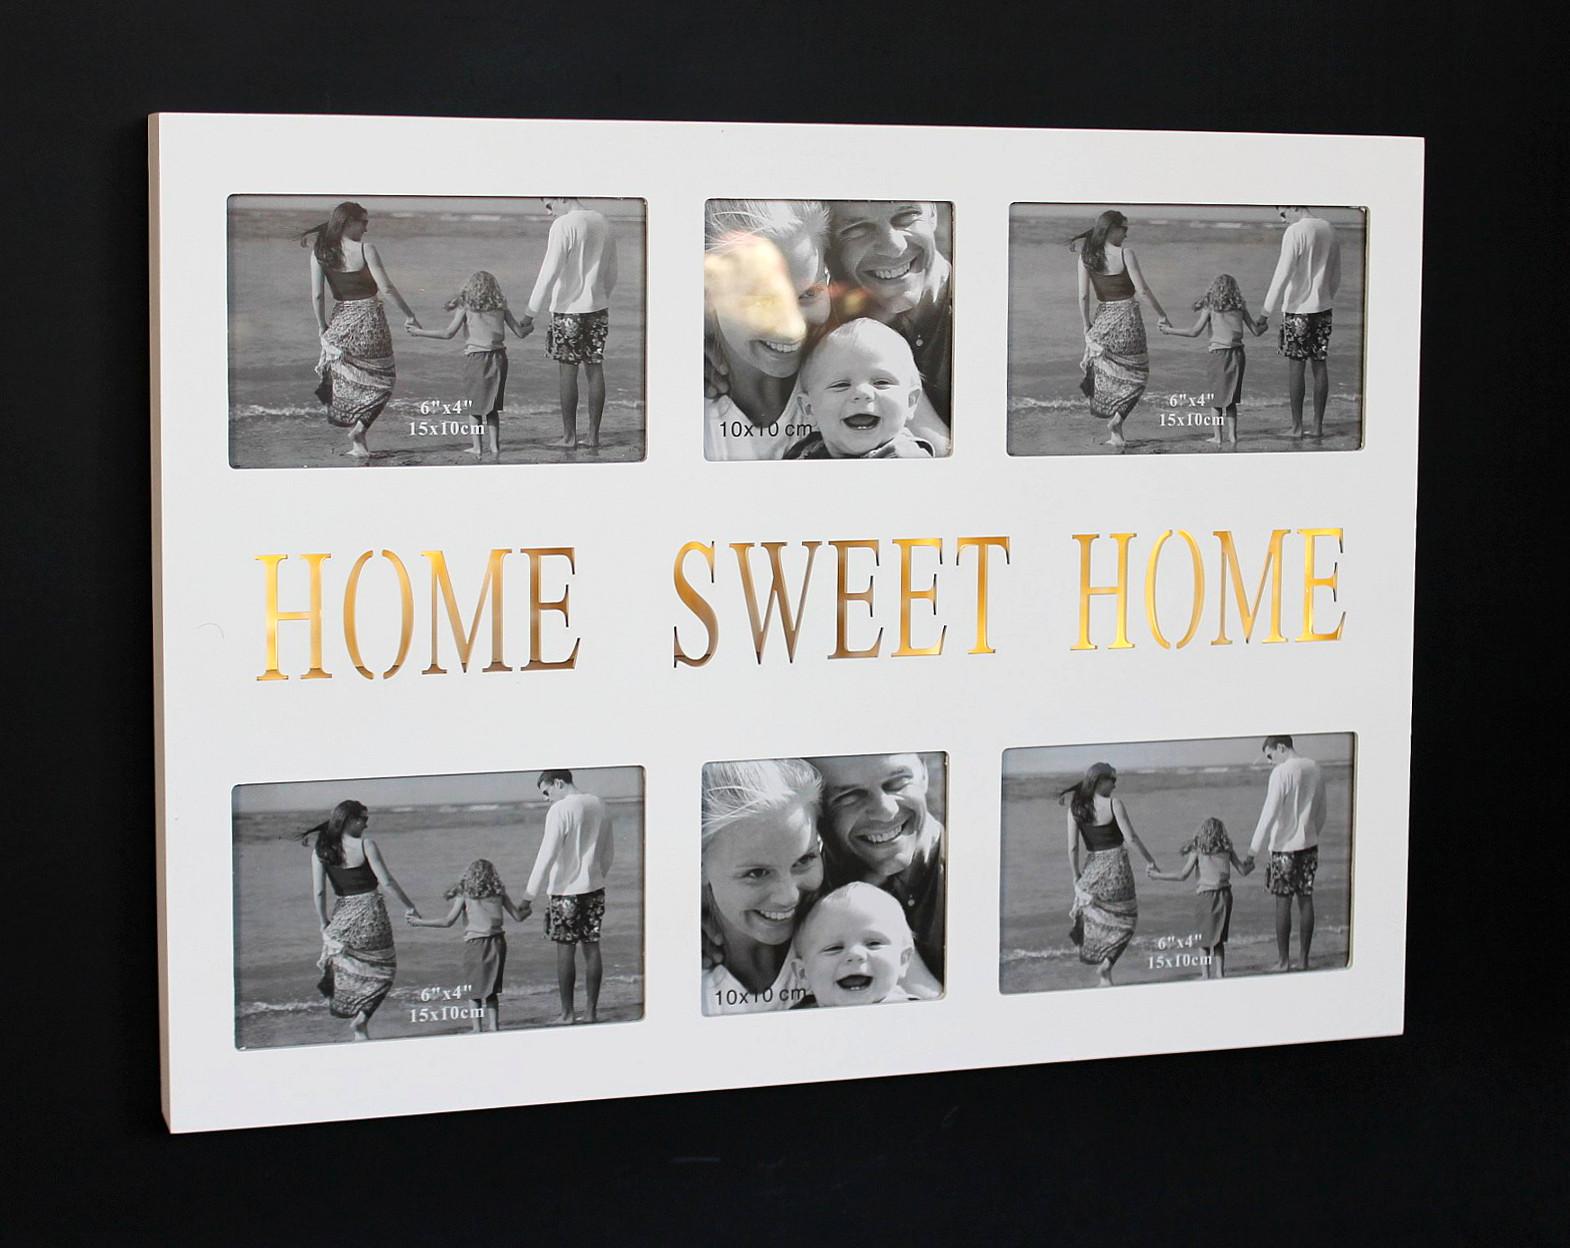 Fotorahmen Home Sweet Home 20464 LED Licht Display 45cm Bilderrahmen ...